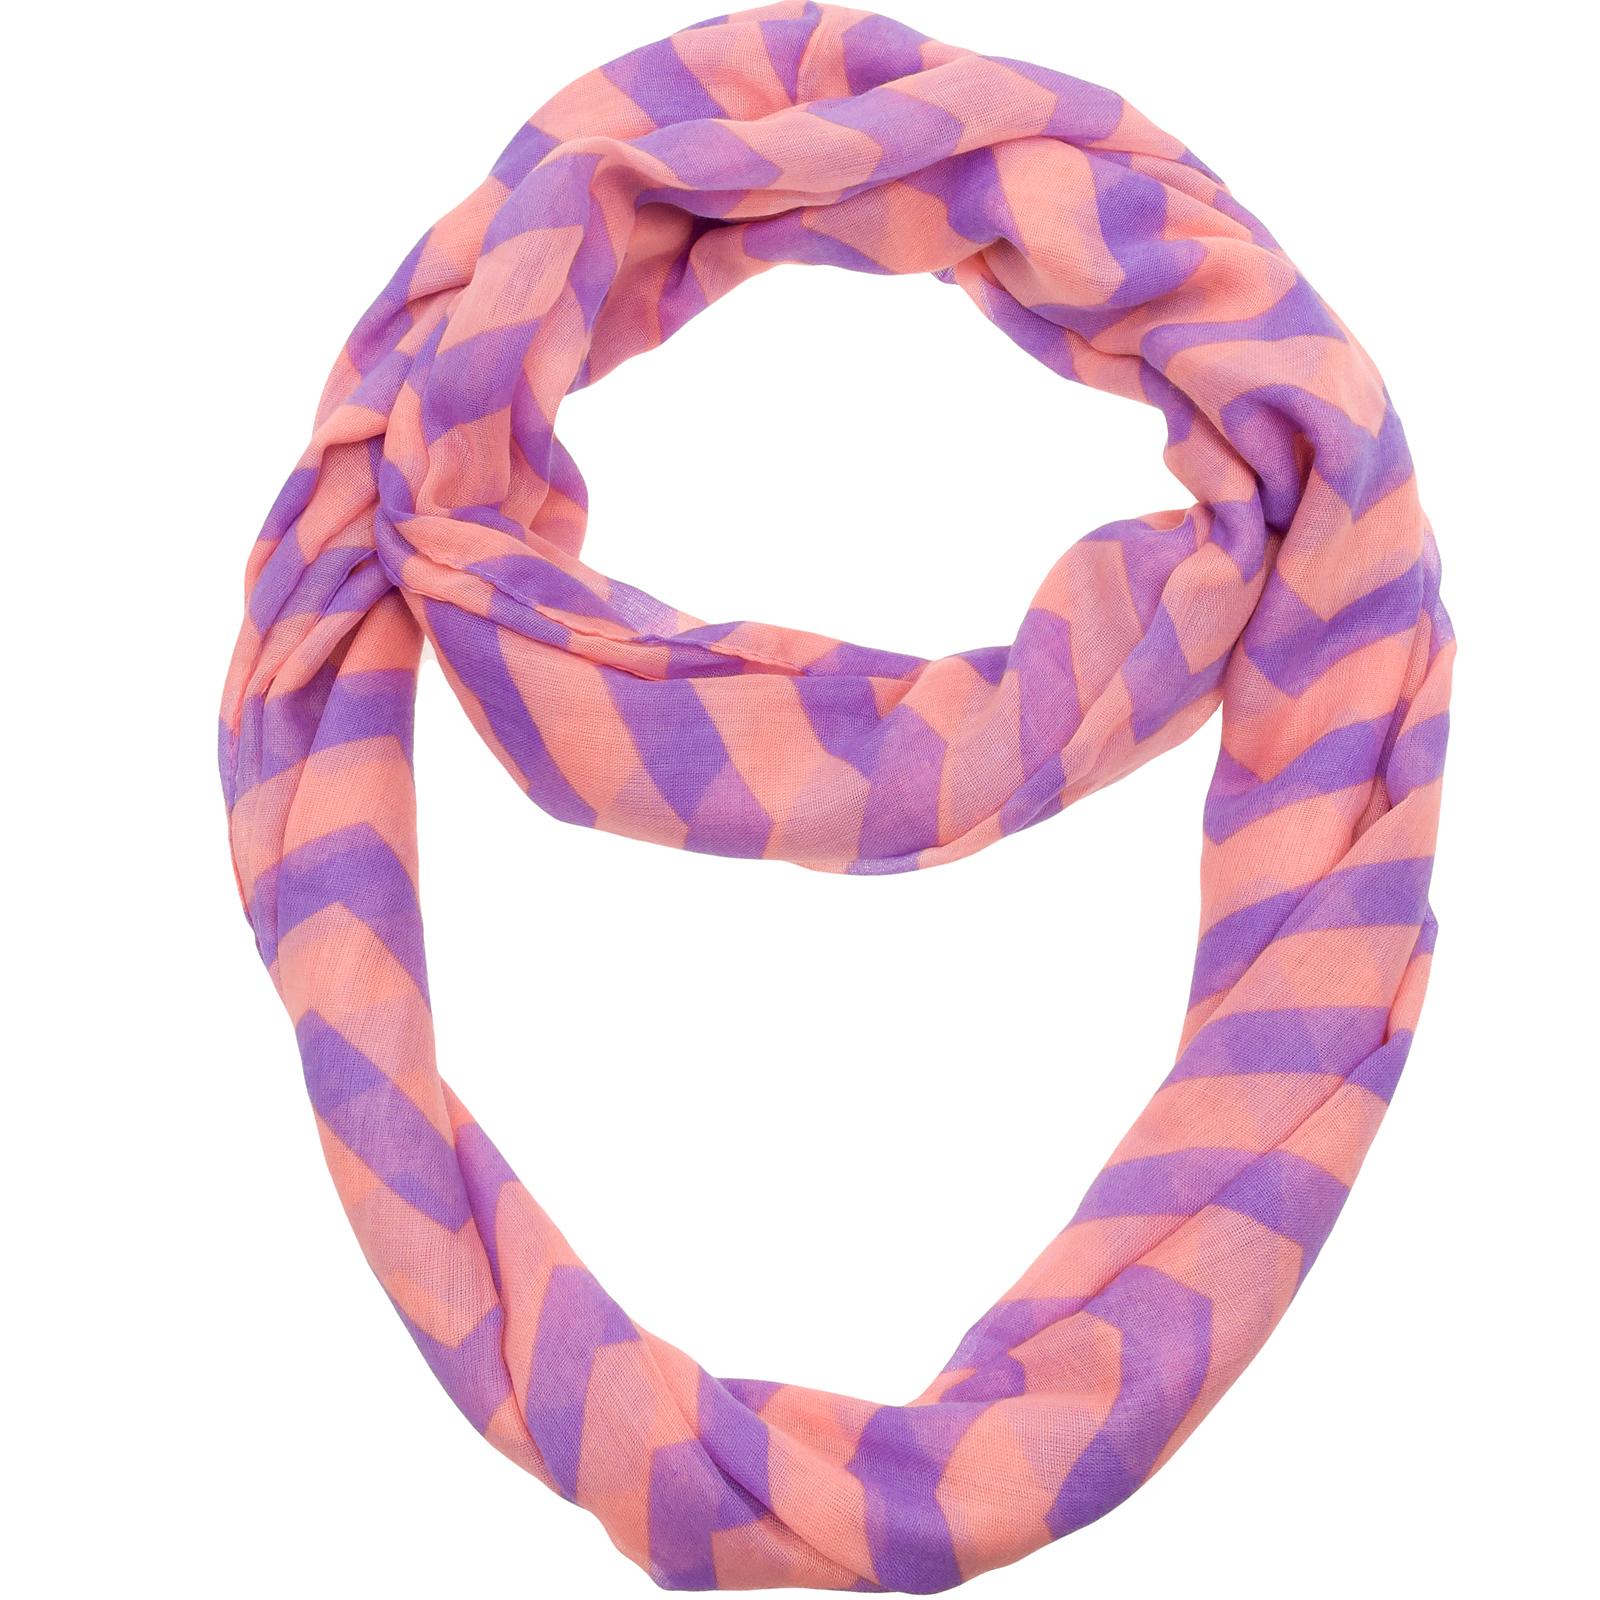 NEW Womens Chevron Infinity Loop Circle Knit Neck Fashion ...